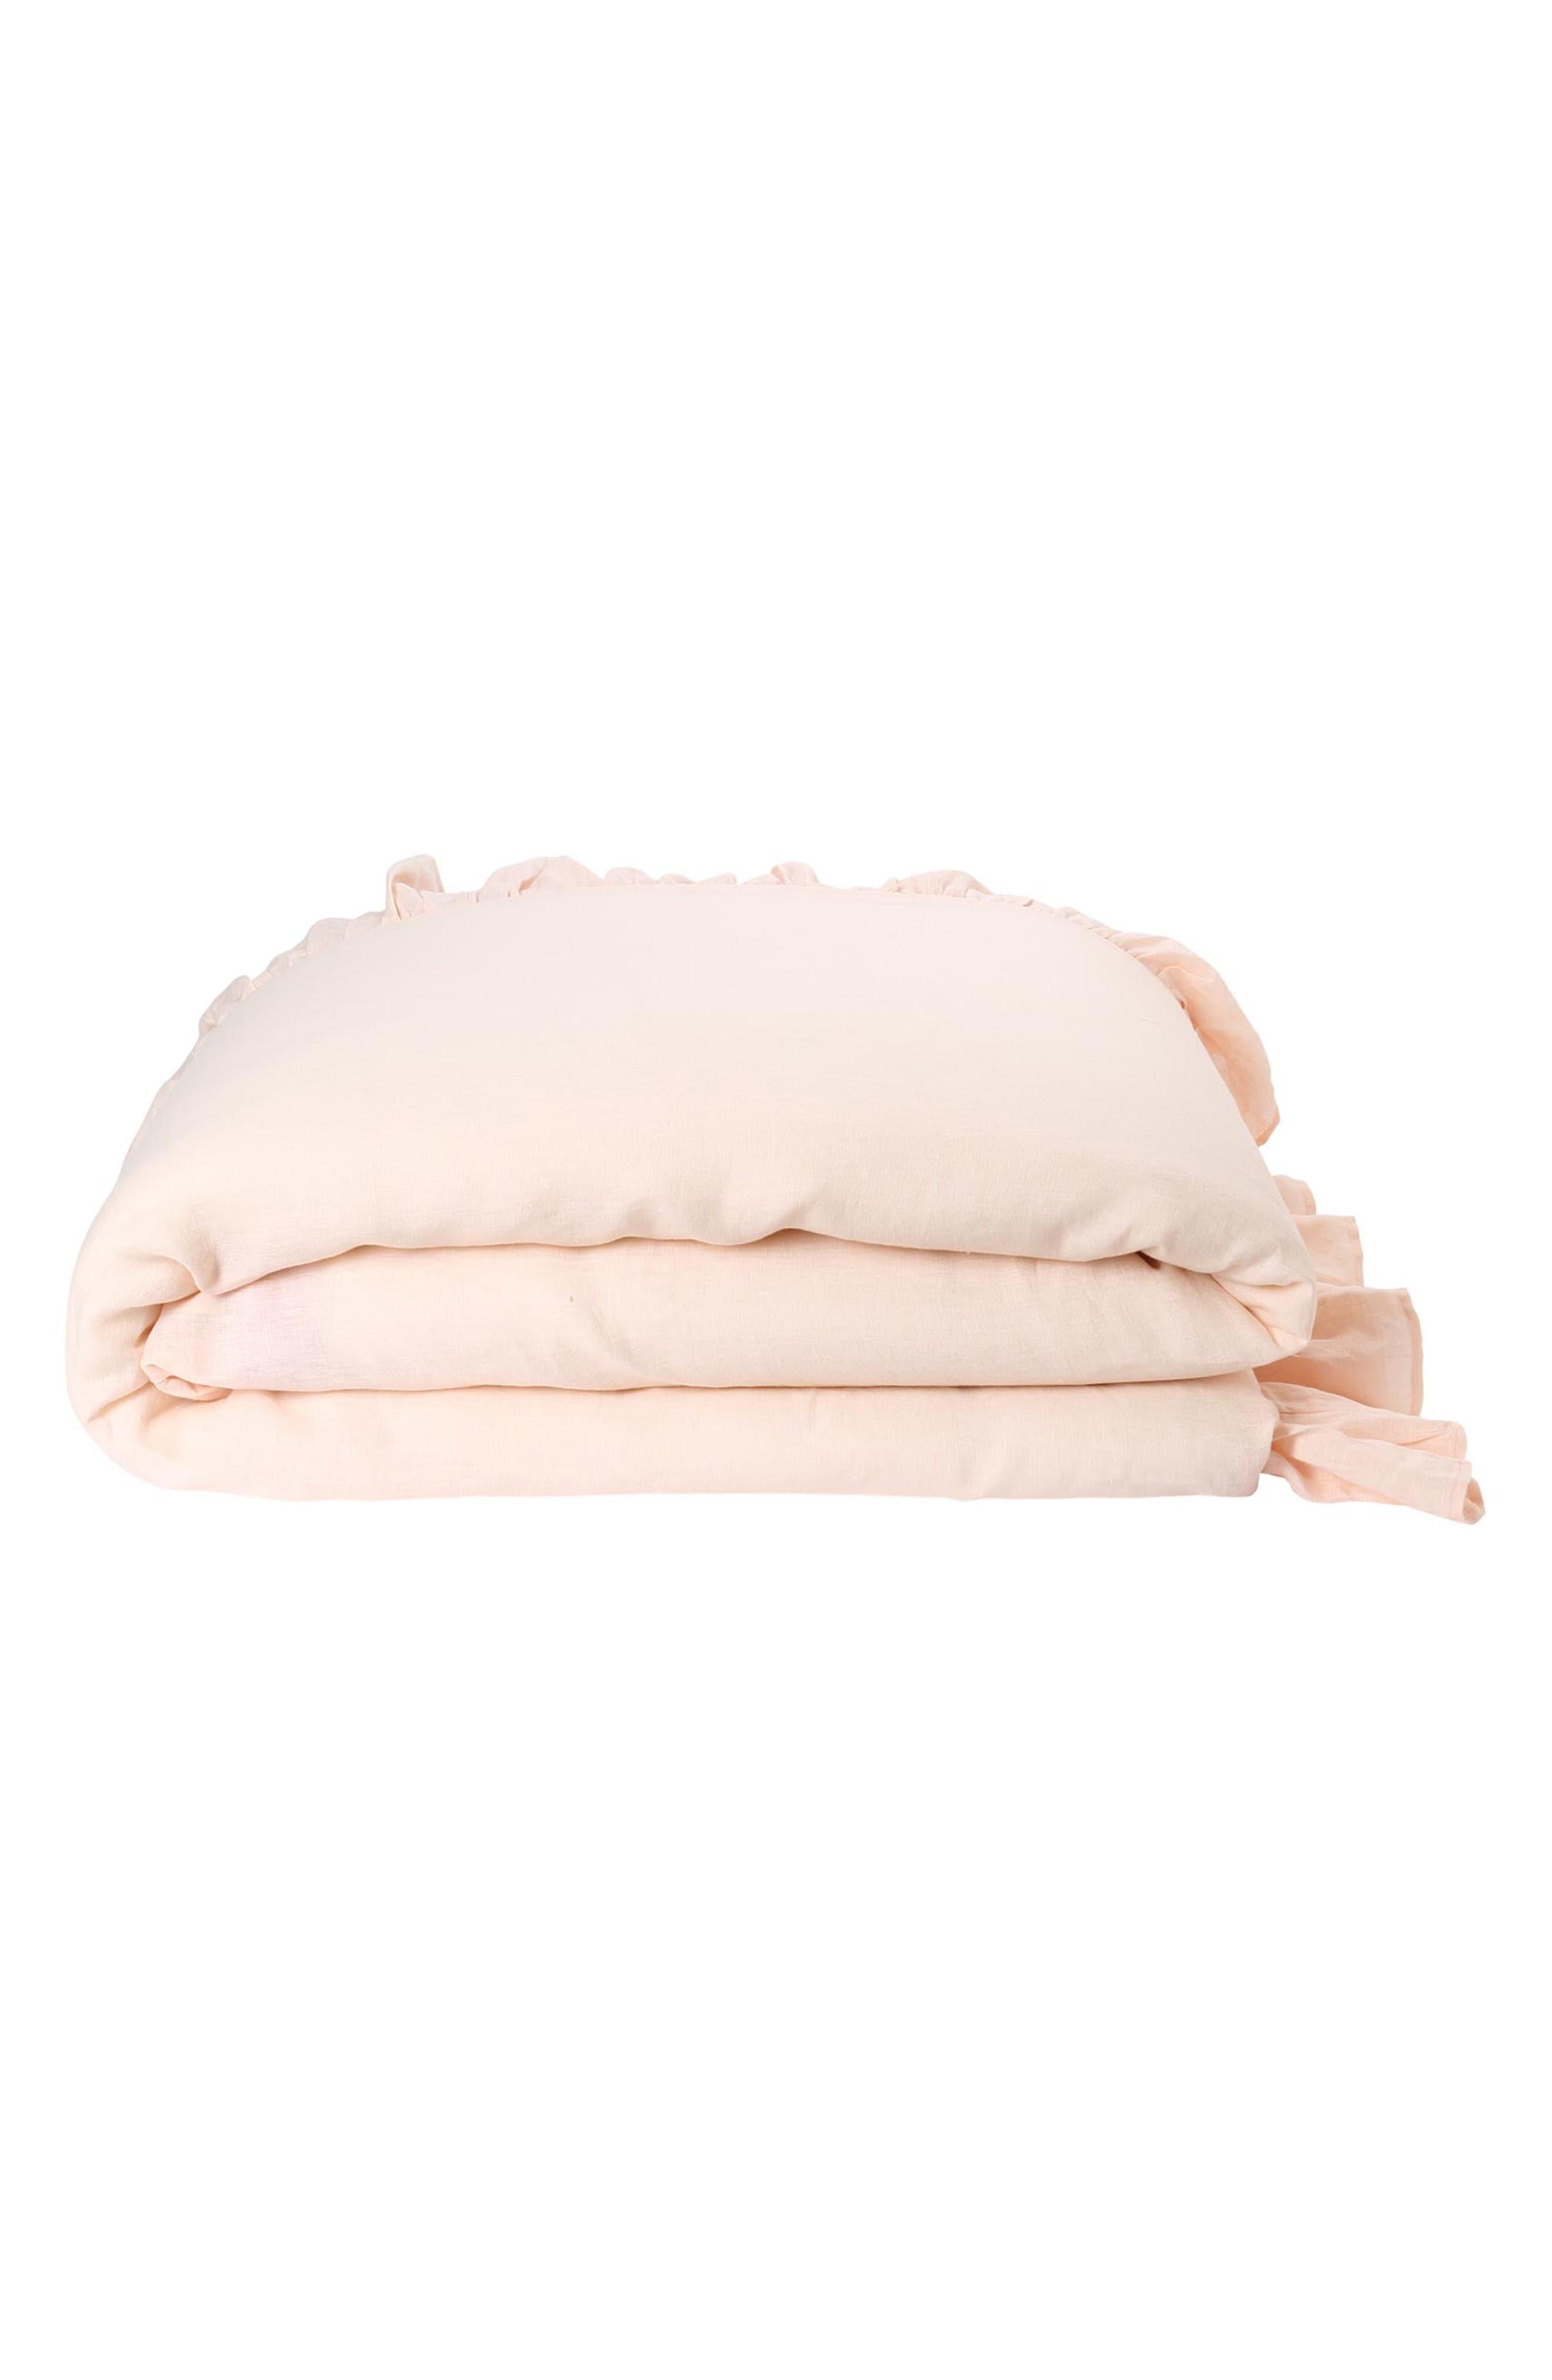 Ruffle Reversible Linen Comforter,                             Alternate thumbnail 2, color,                             Multi